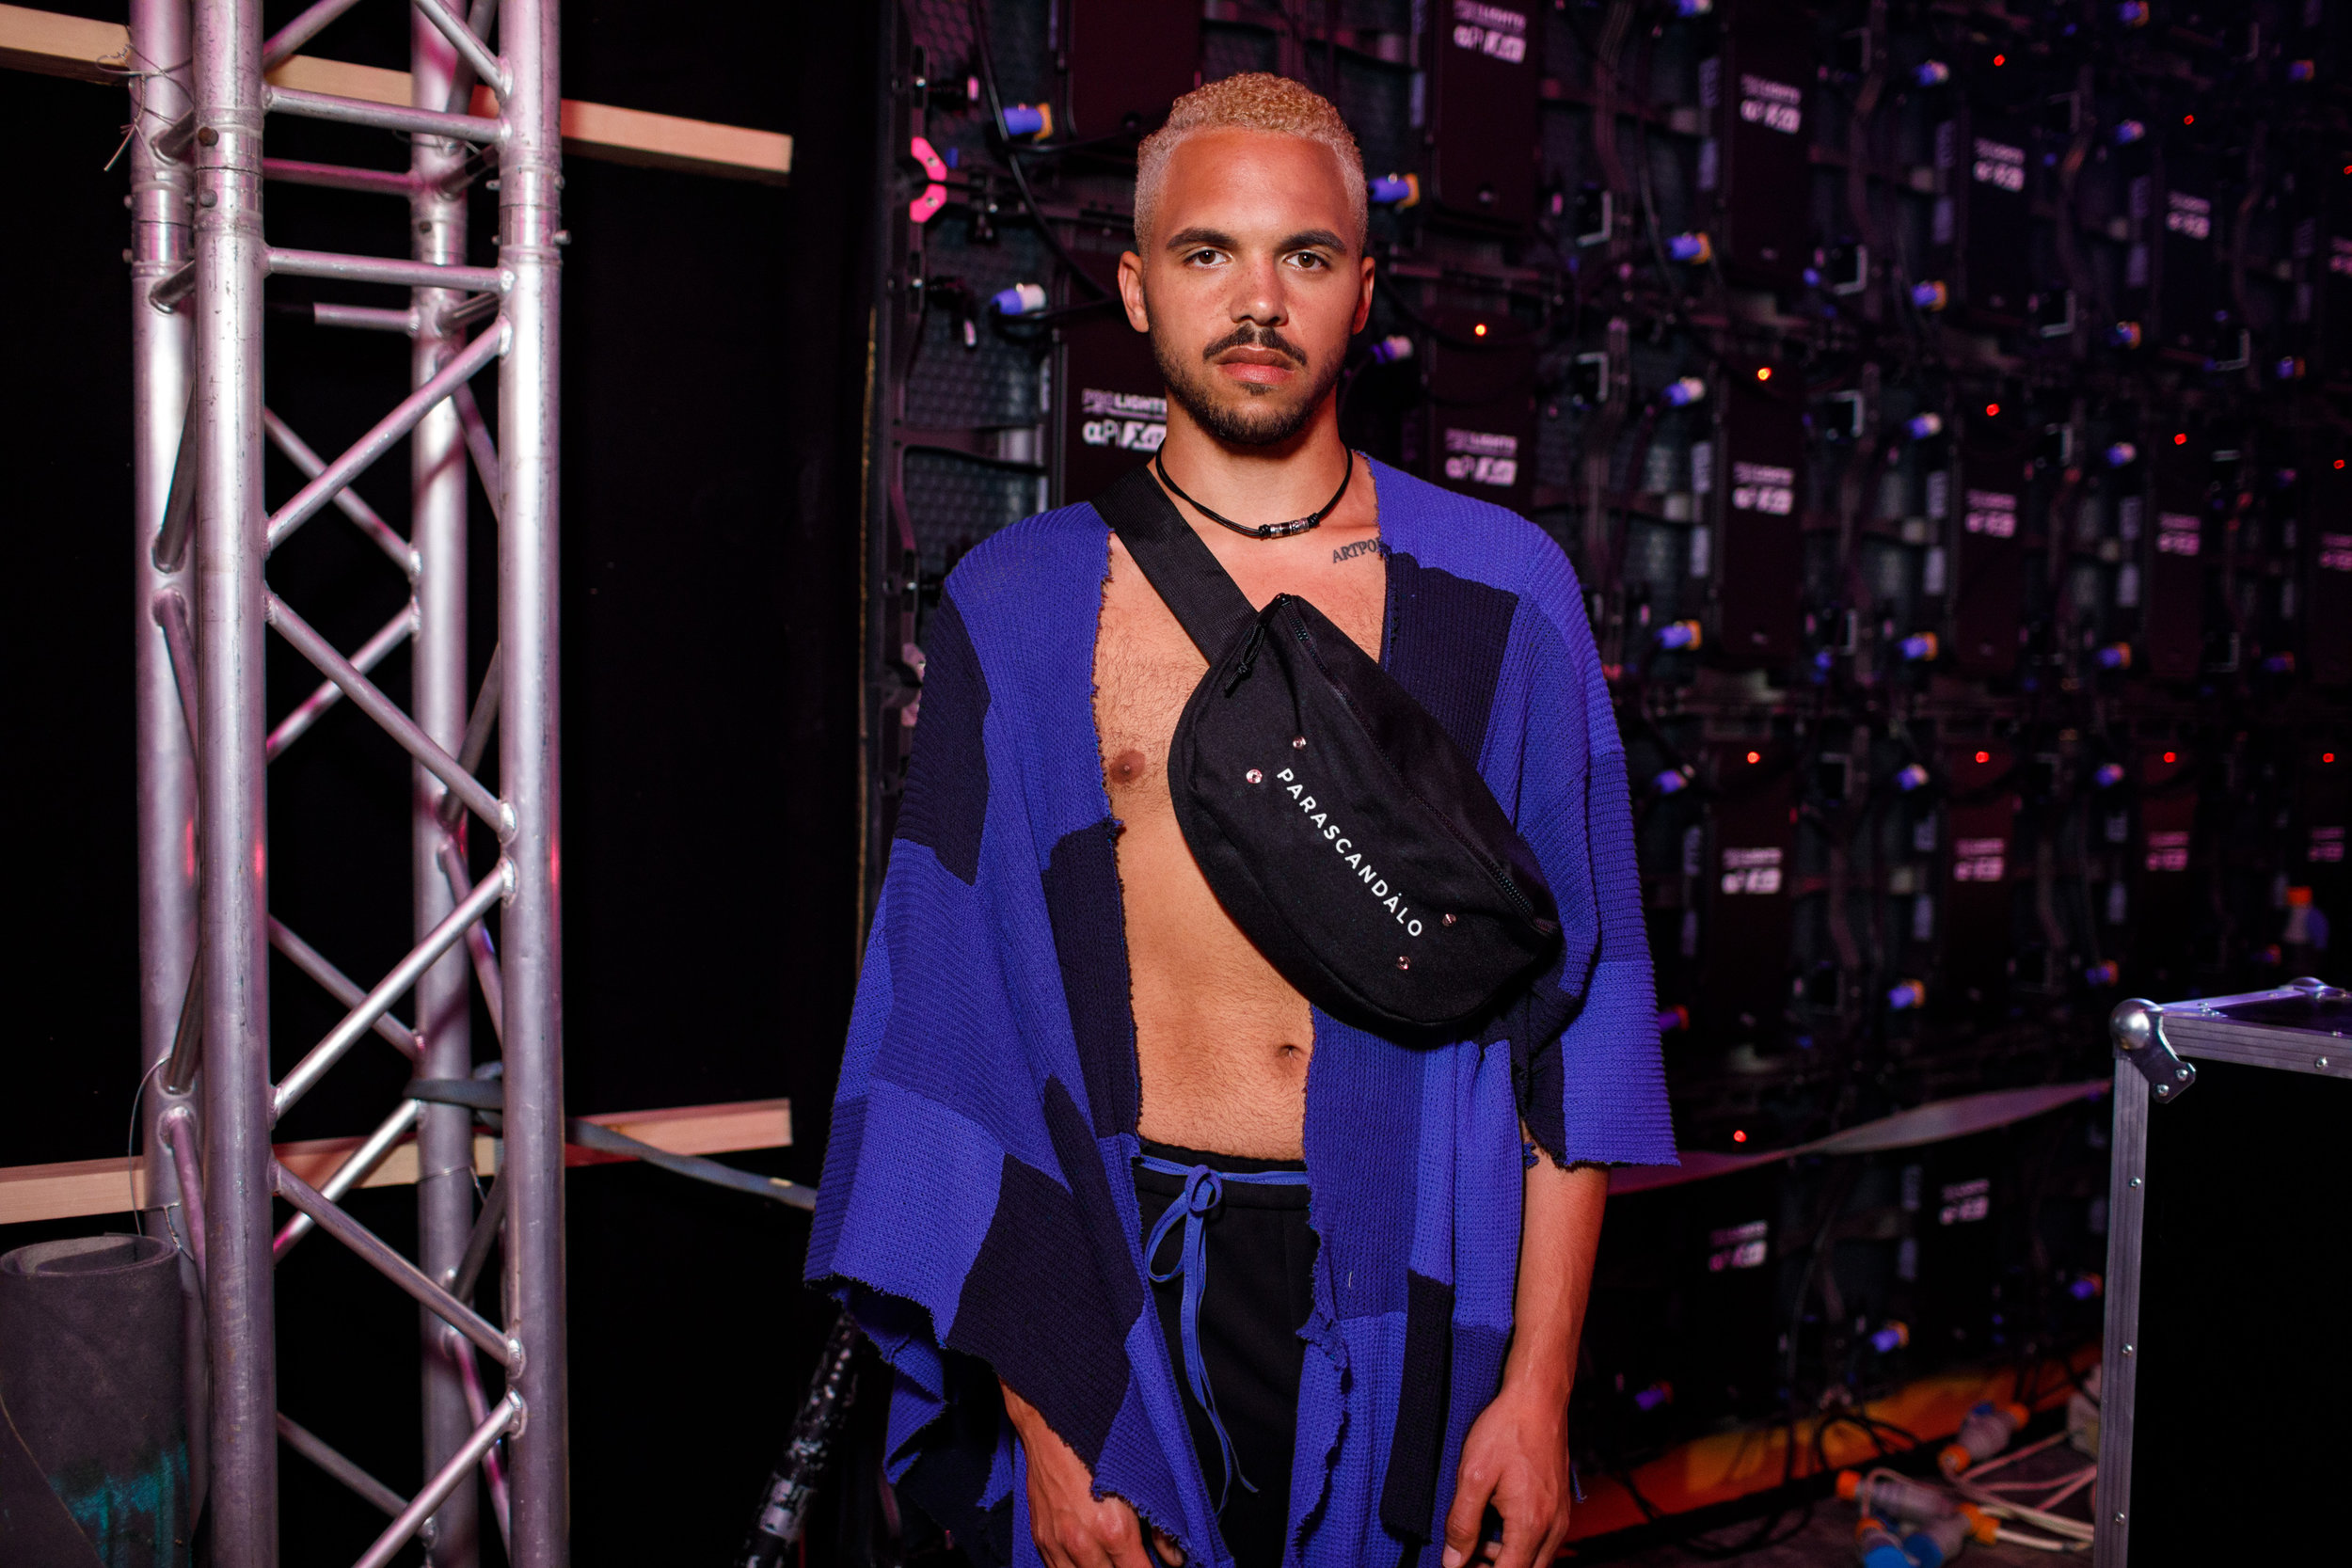 Parascandalo -Backstage, Malta Fashion Week